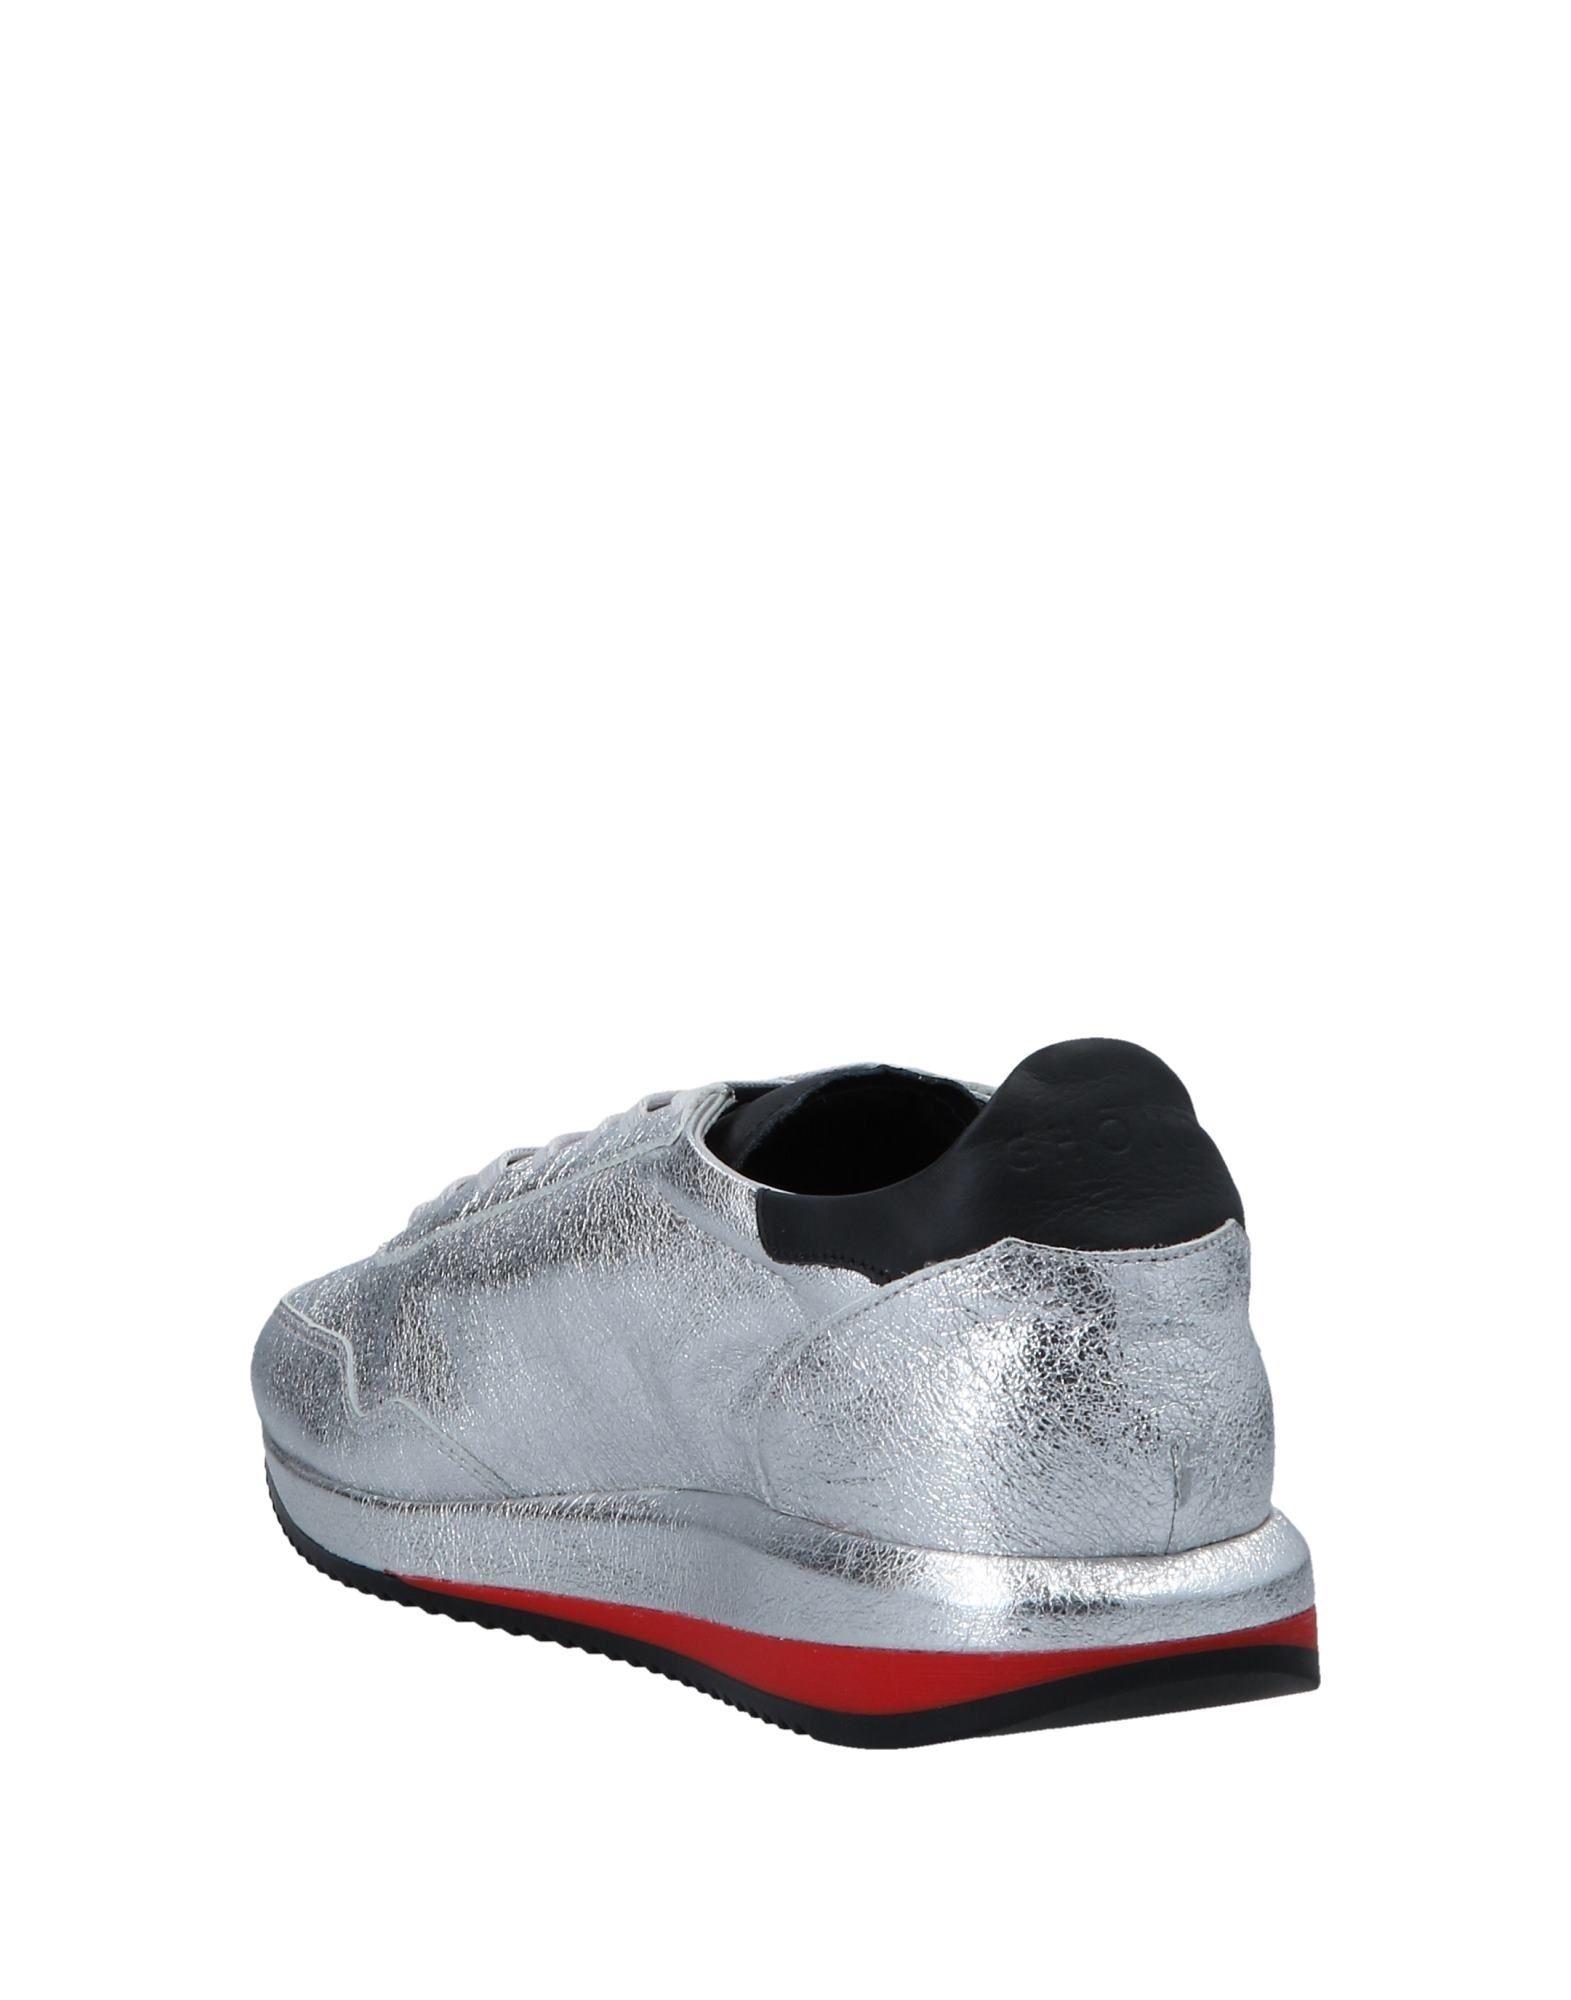 Ghōud Venice Sneakers Herren  Schuhe 11549028KQ Gute Qualität beliebte Schuhe  ec76c8